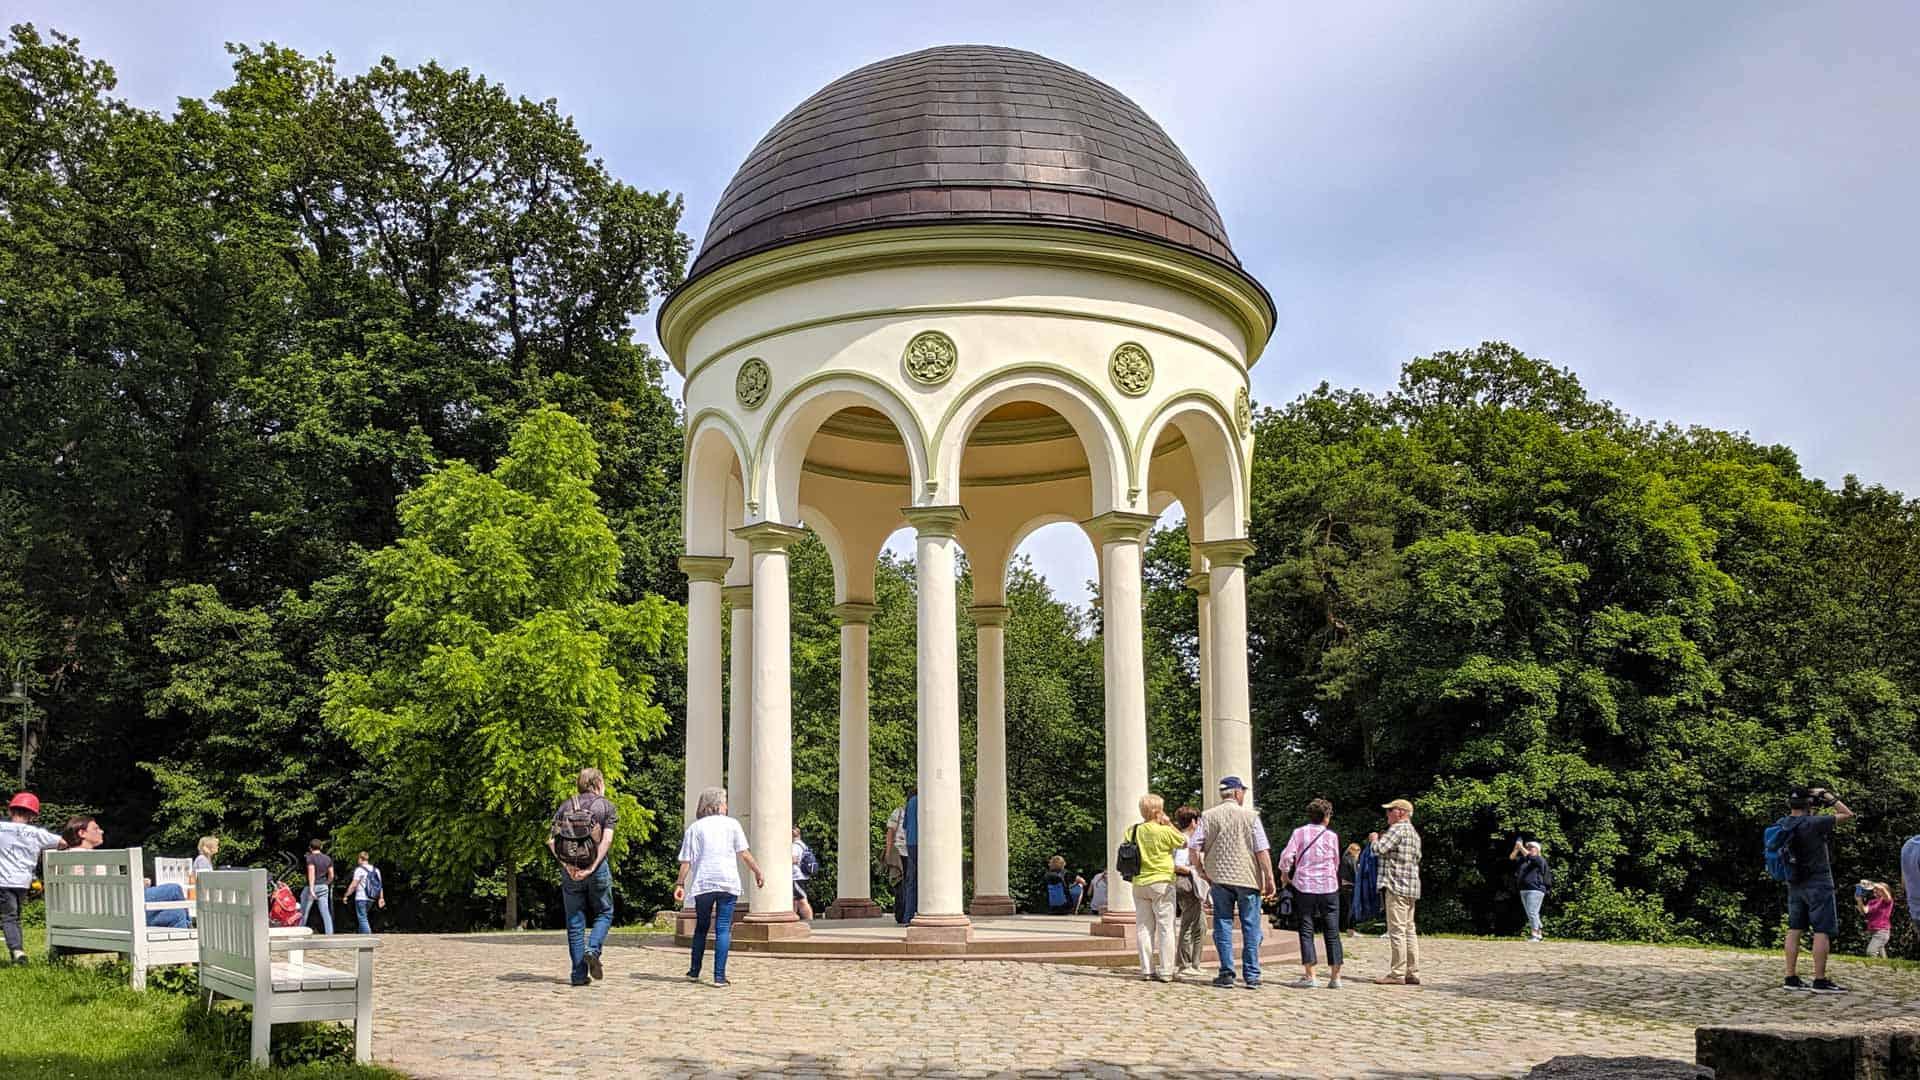 Neroberg park